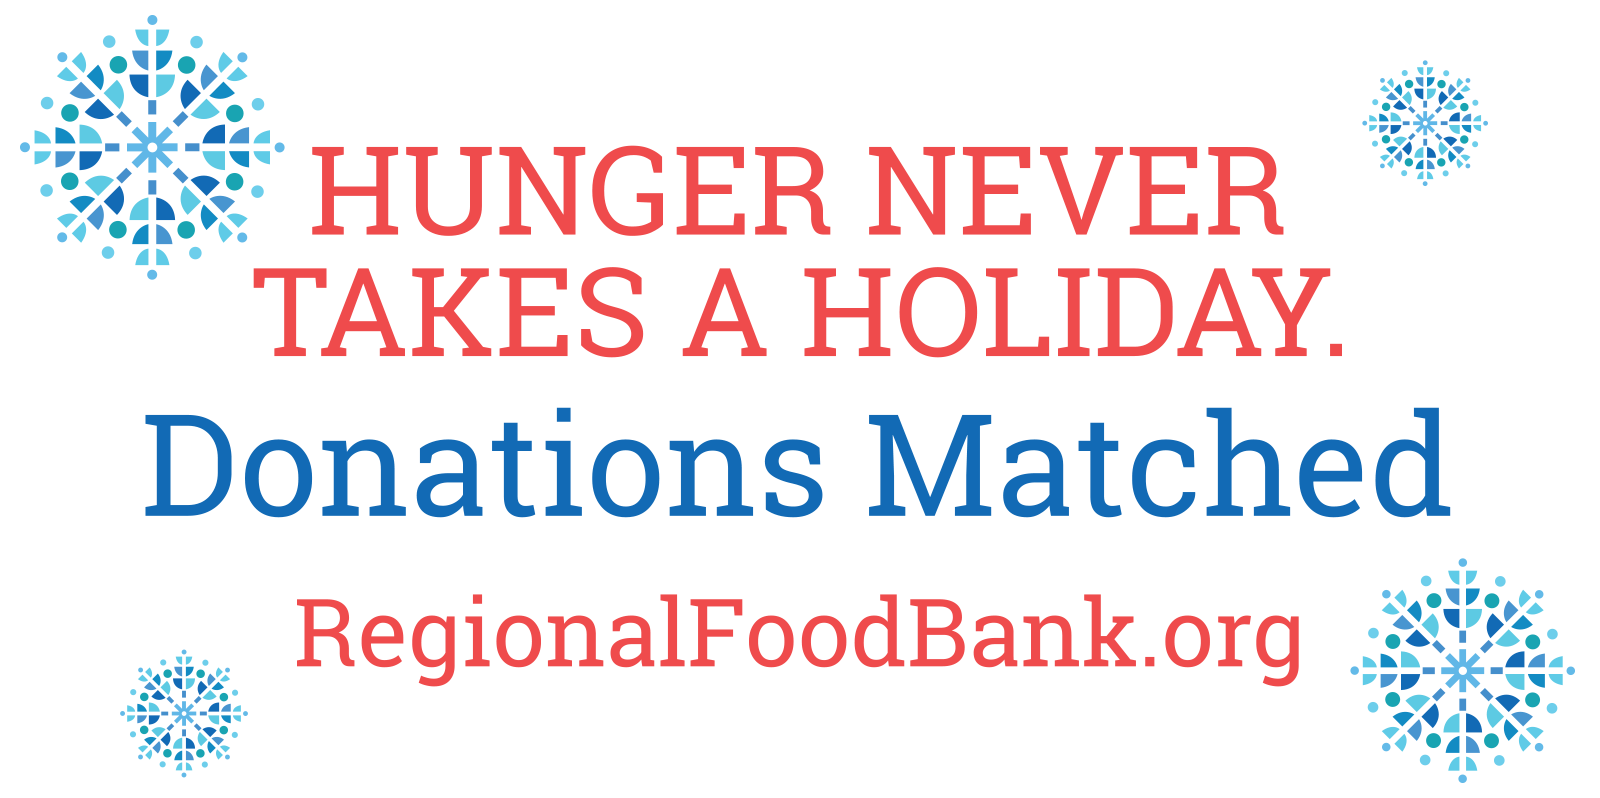 Regional Food Bank